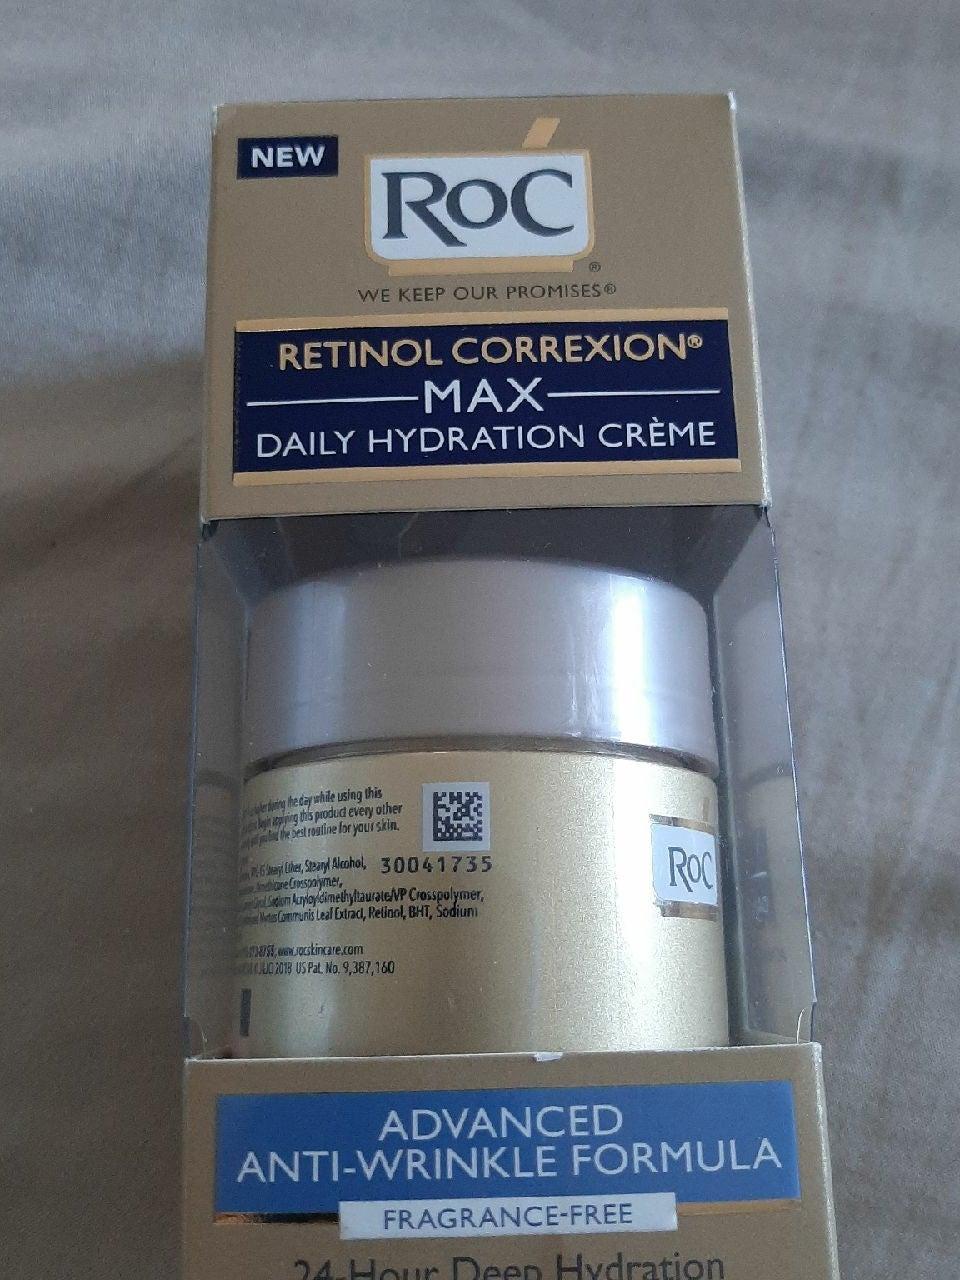 RoC Retinol Correxion Max Daily